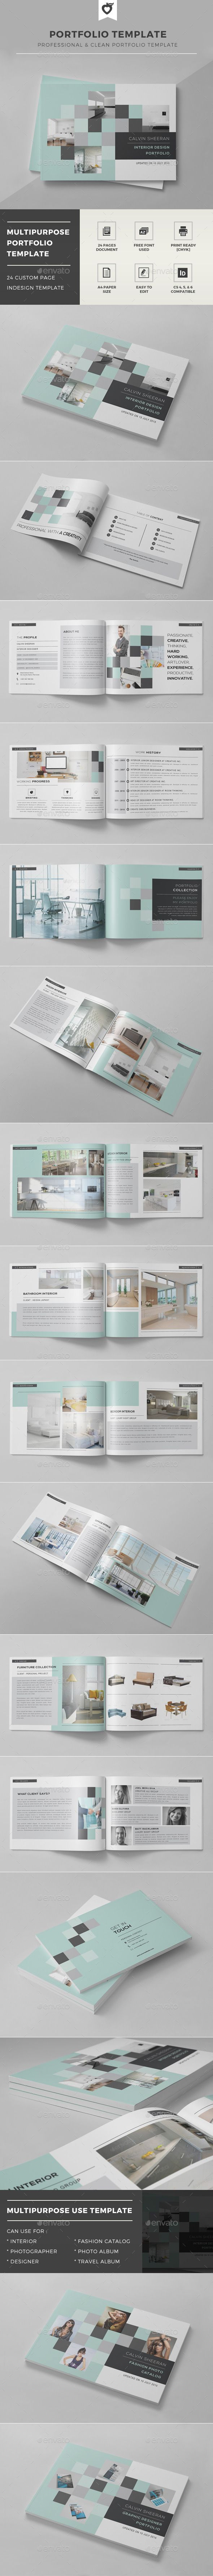 Portfolio Brochure Template #design #print Download: http://graphicriver.net/item/portfolio-template/11969753?ref=ksioks